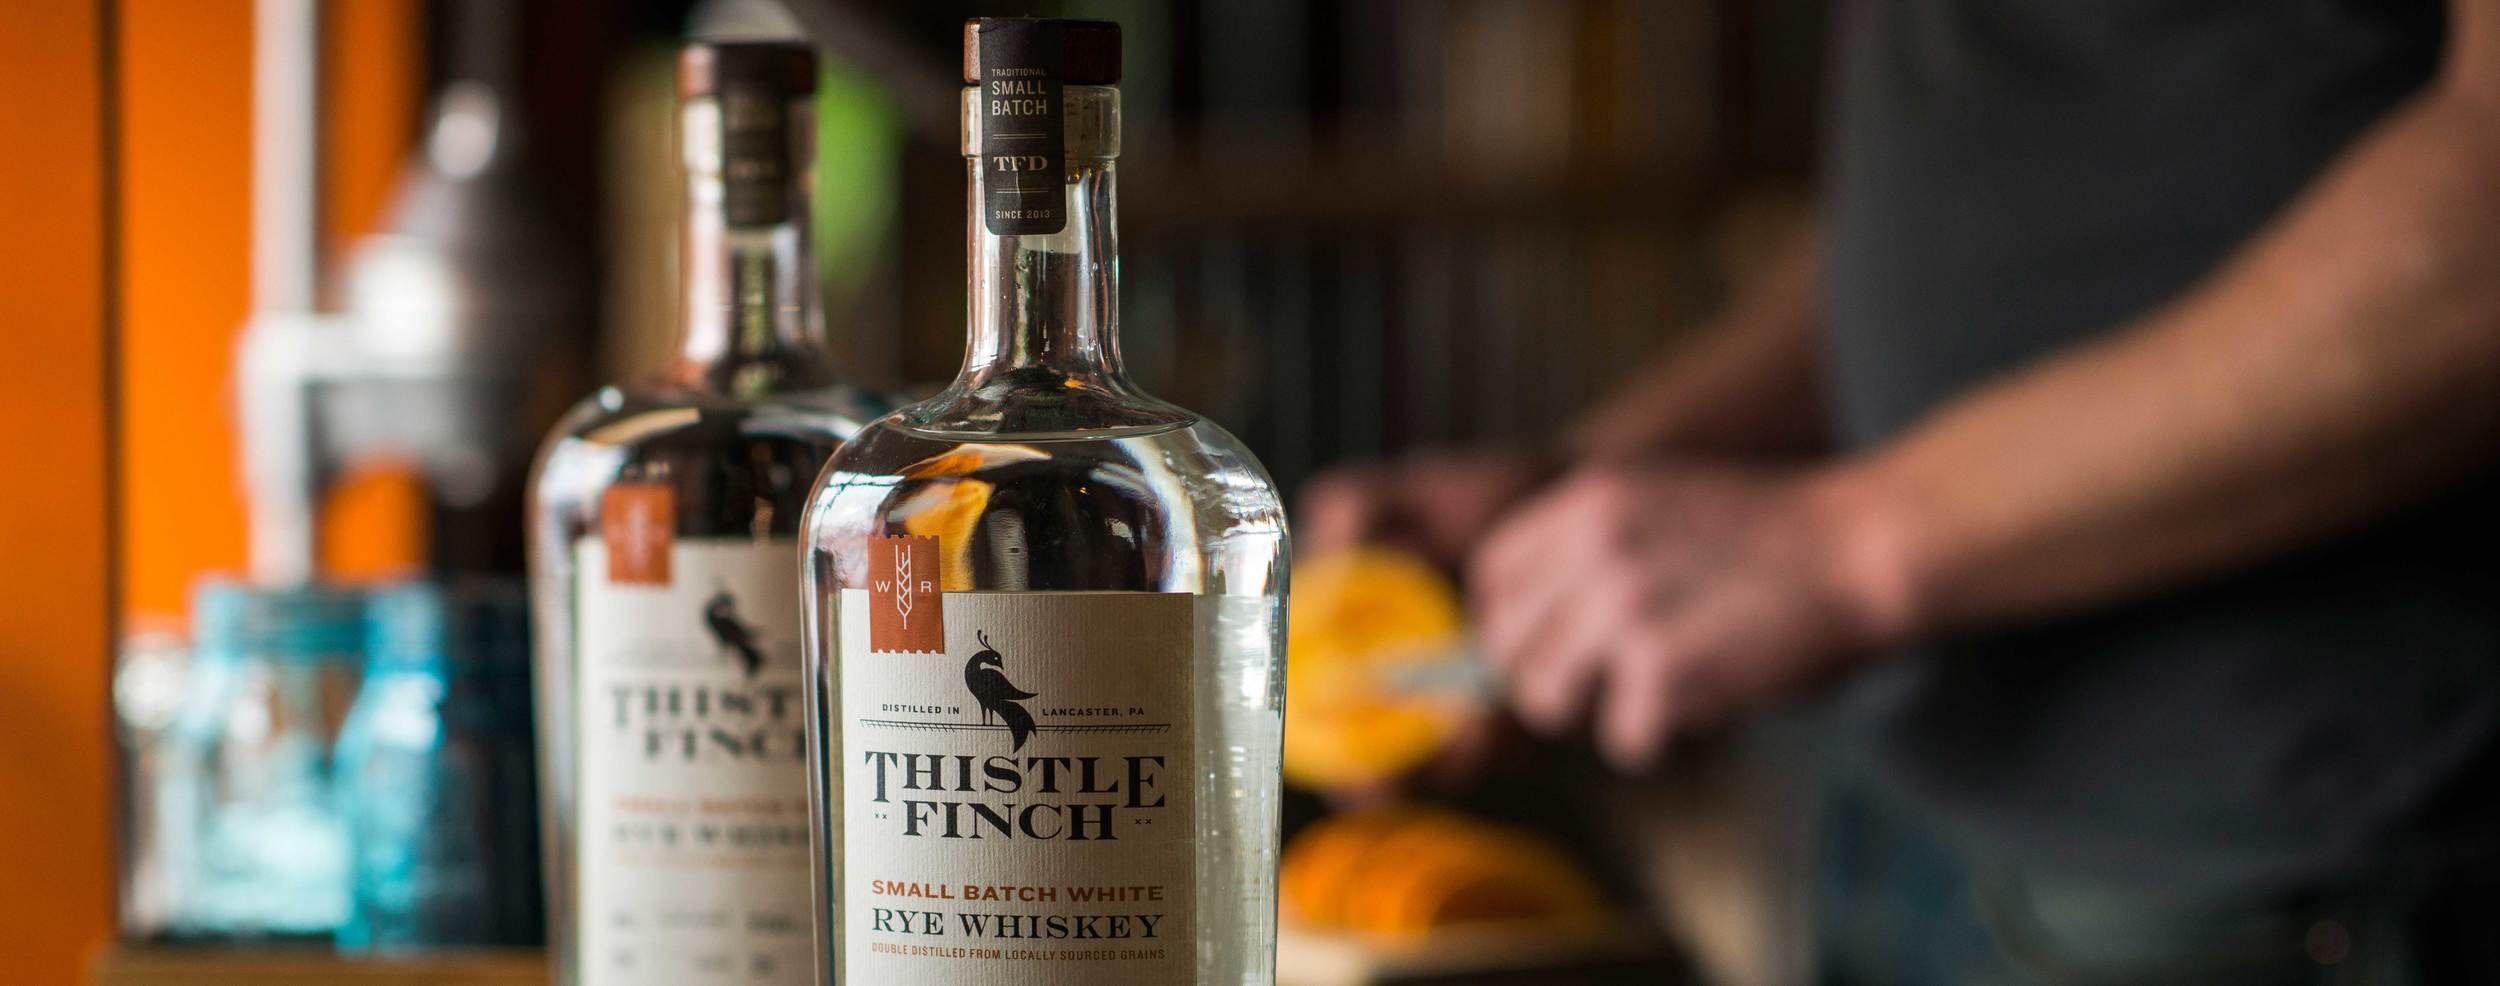 2015_thistlefinch lancaster pa distillery craft spirits